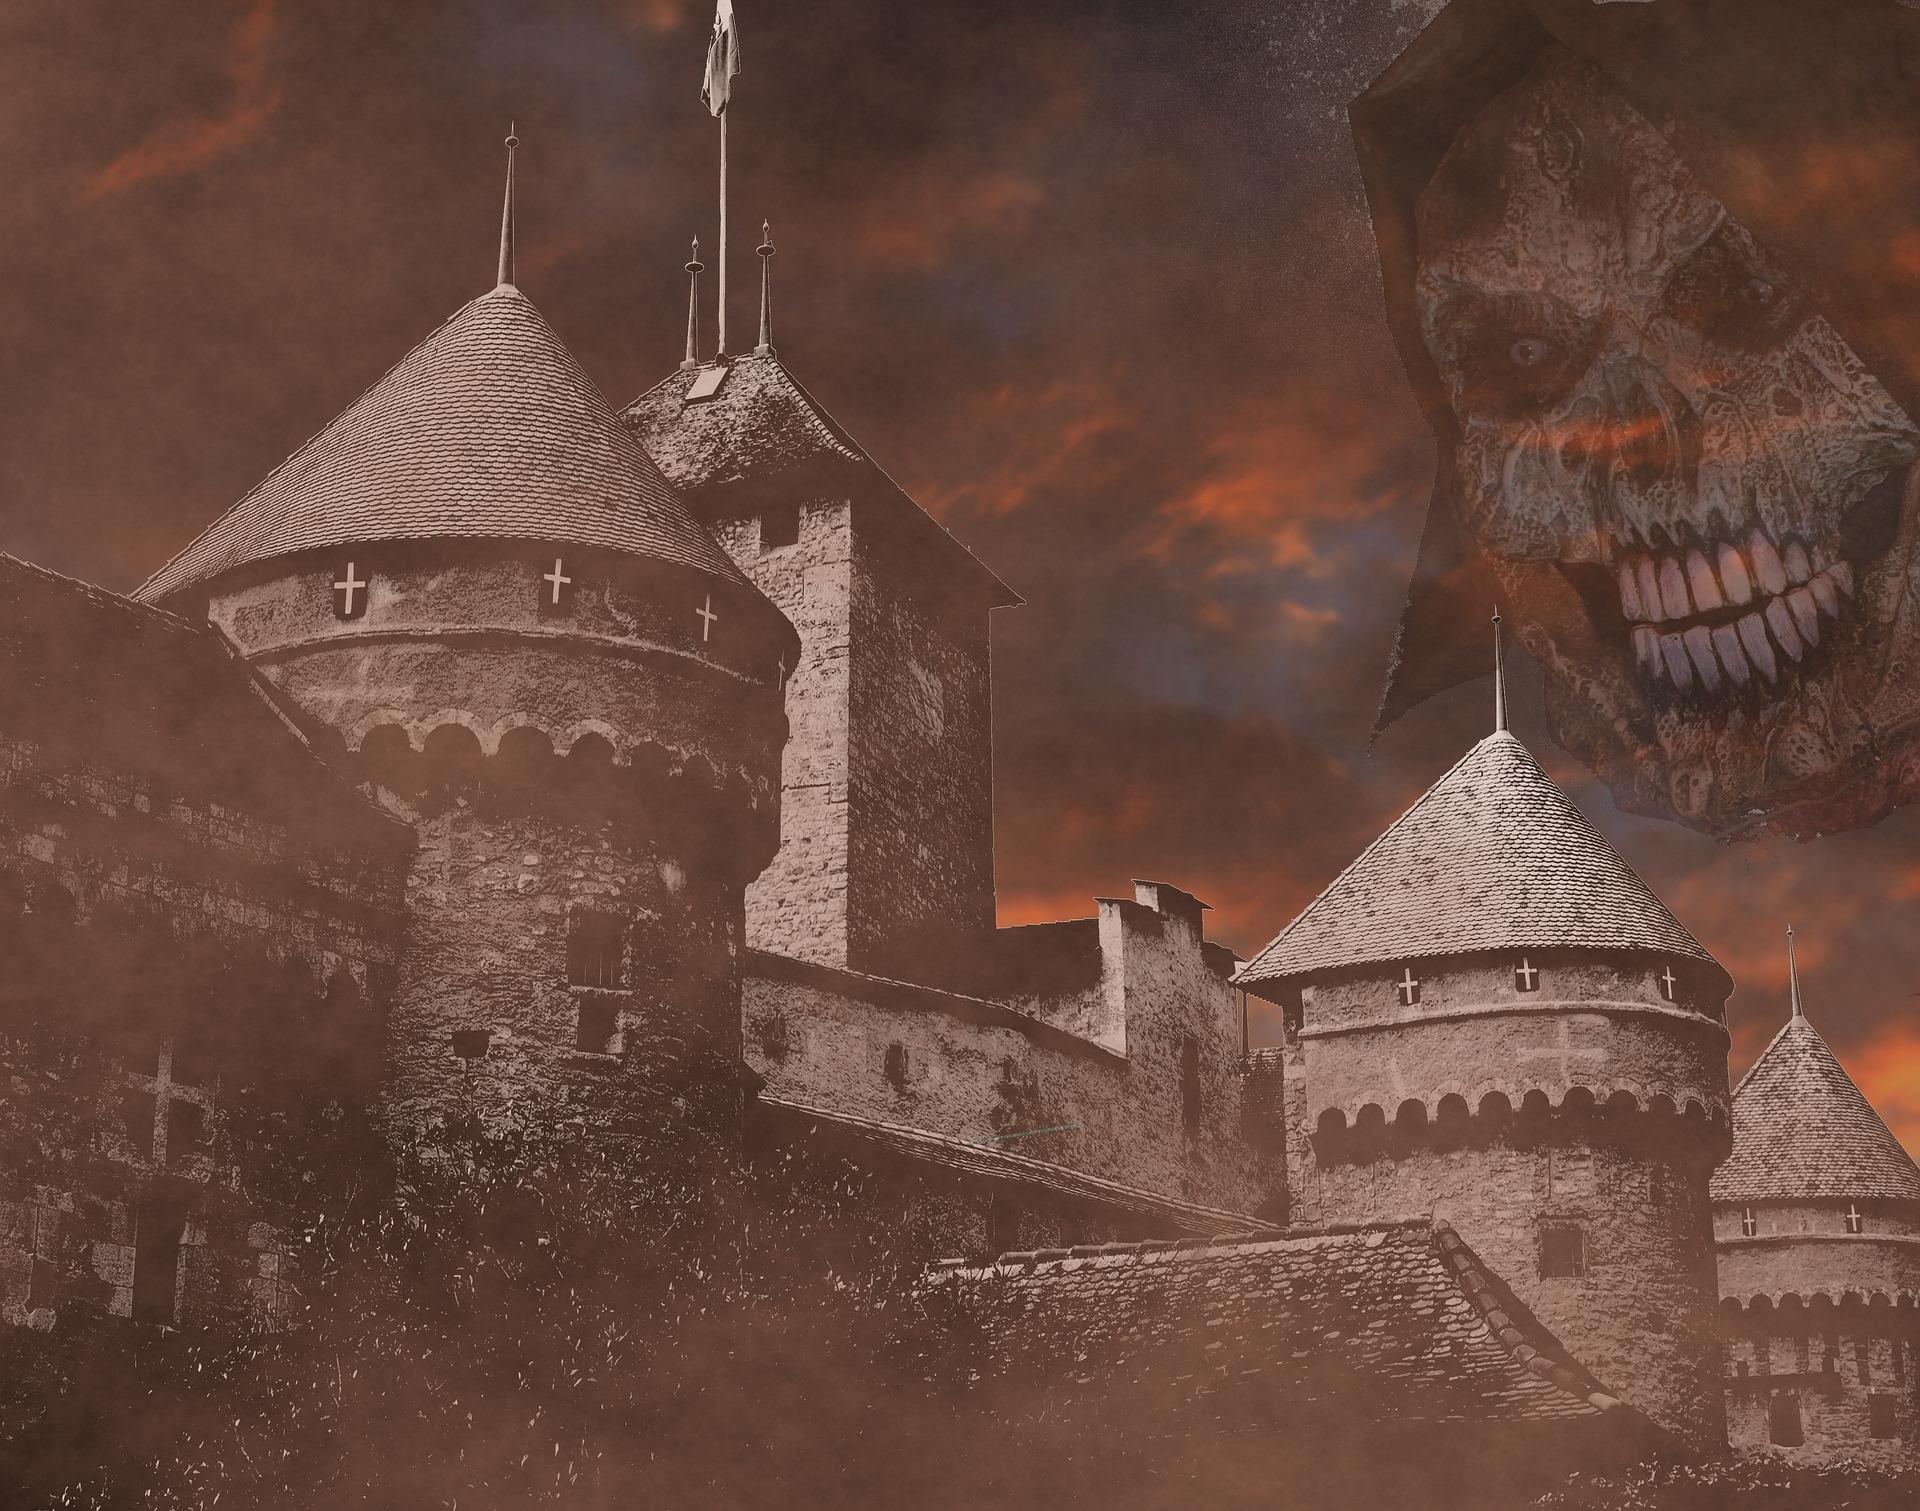 Halloween Horror, Castle, Construction, Dark, Death, HQ Photo